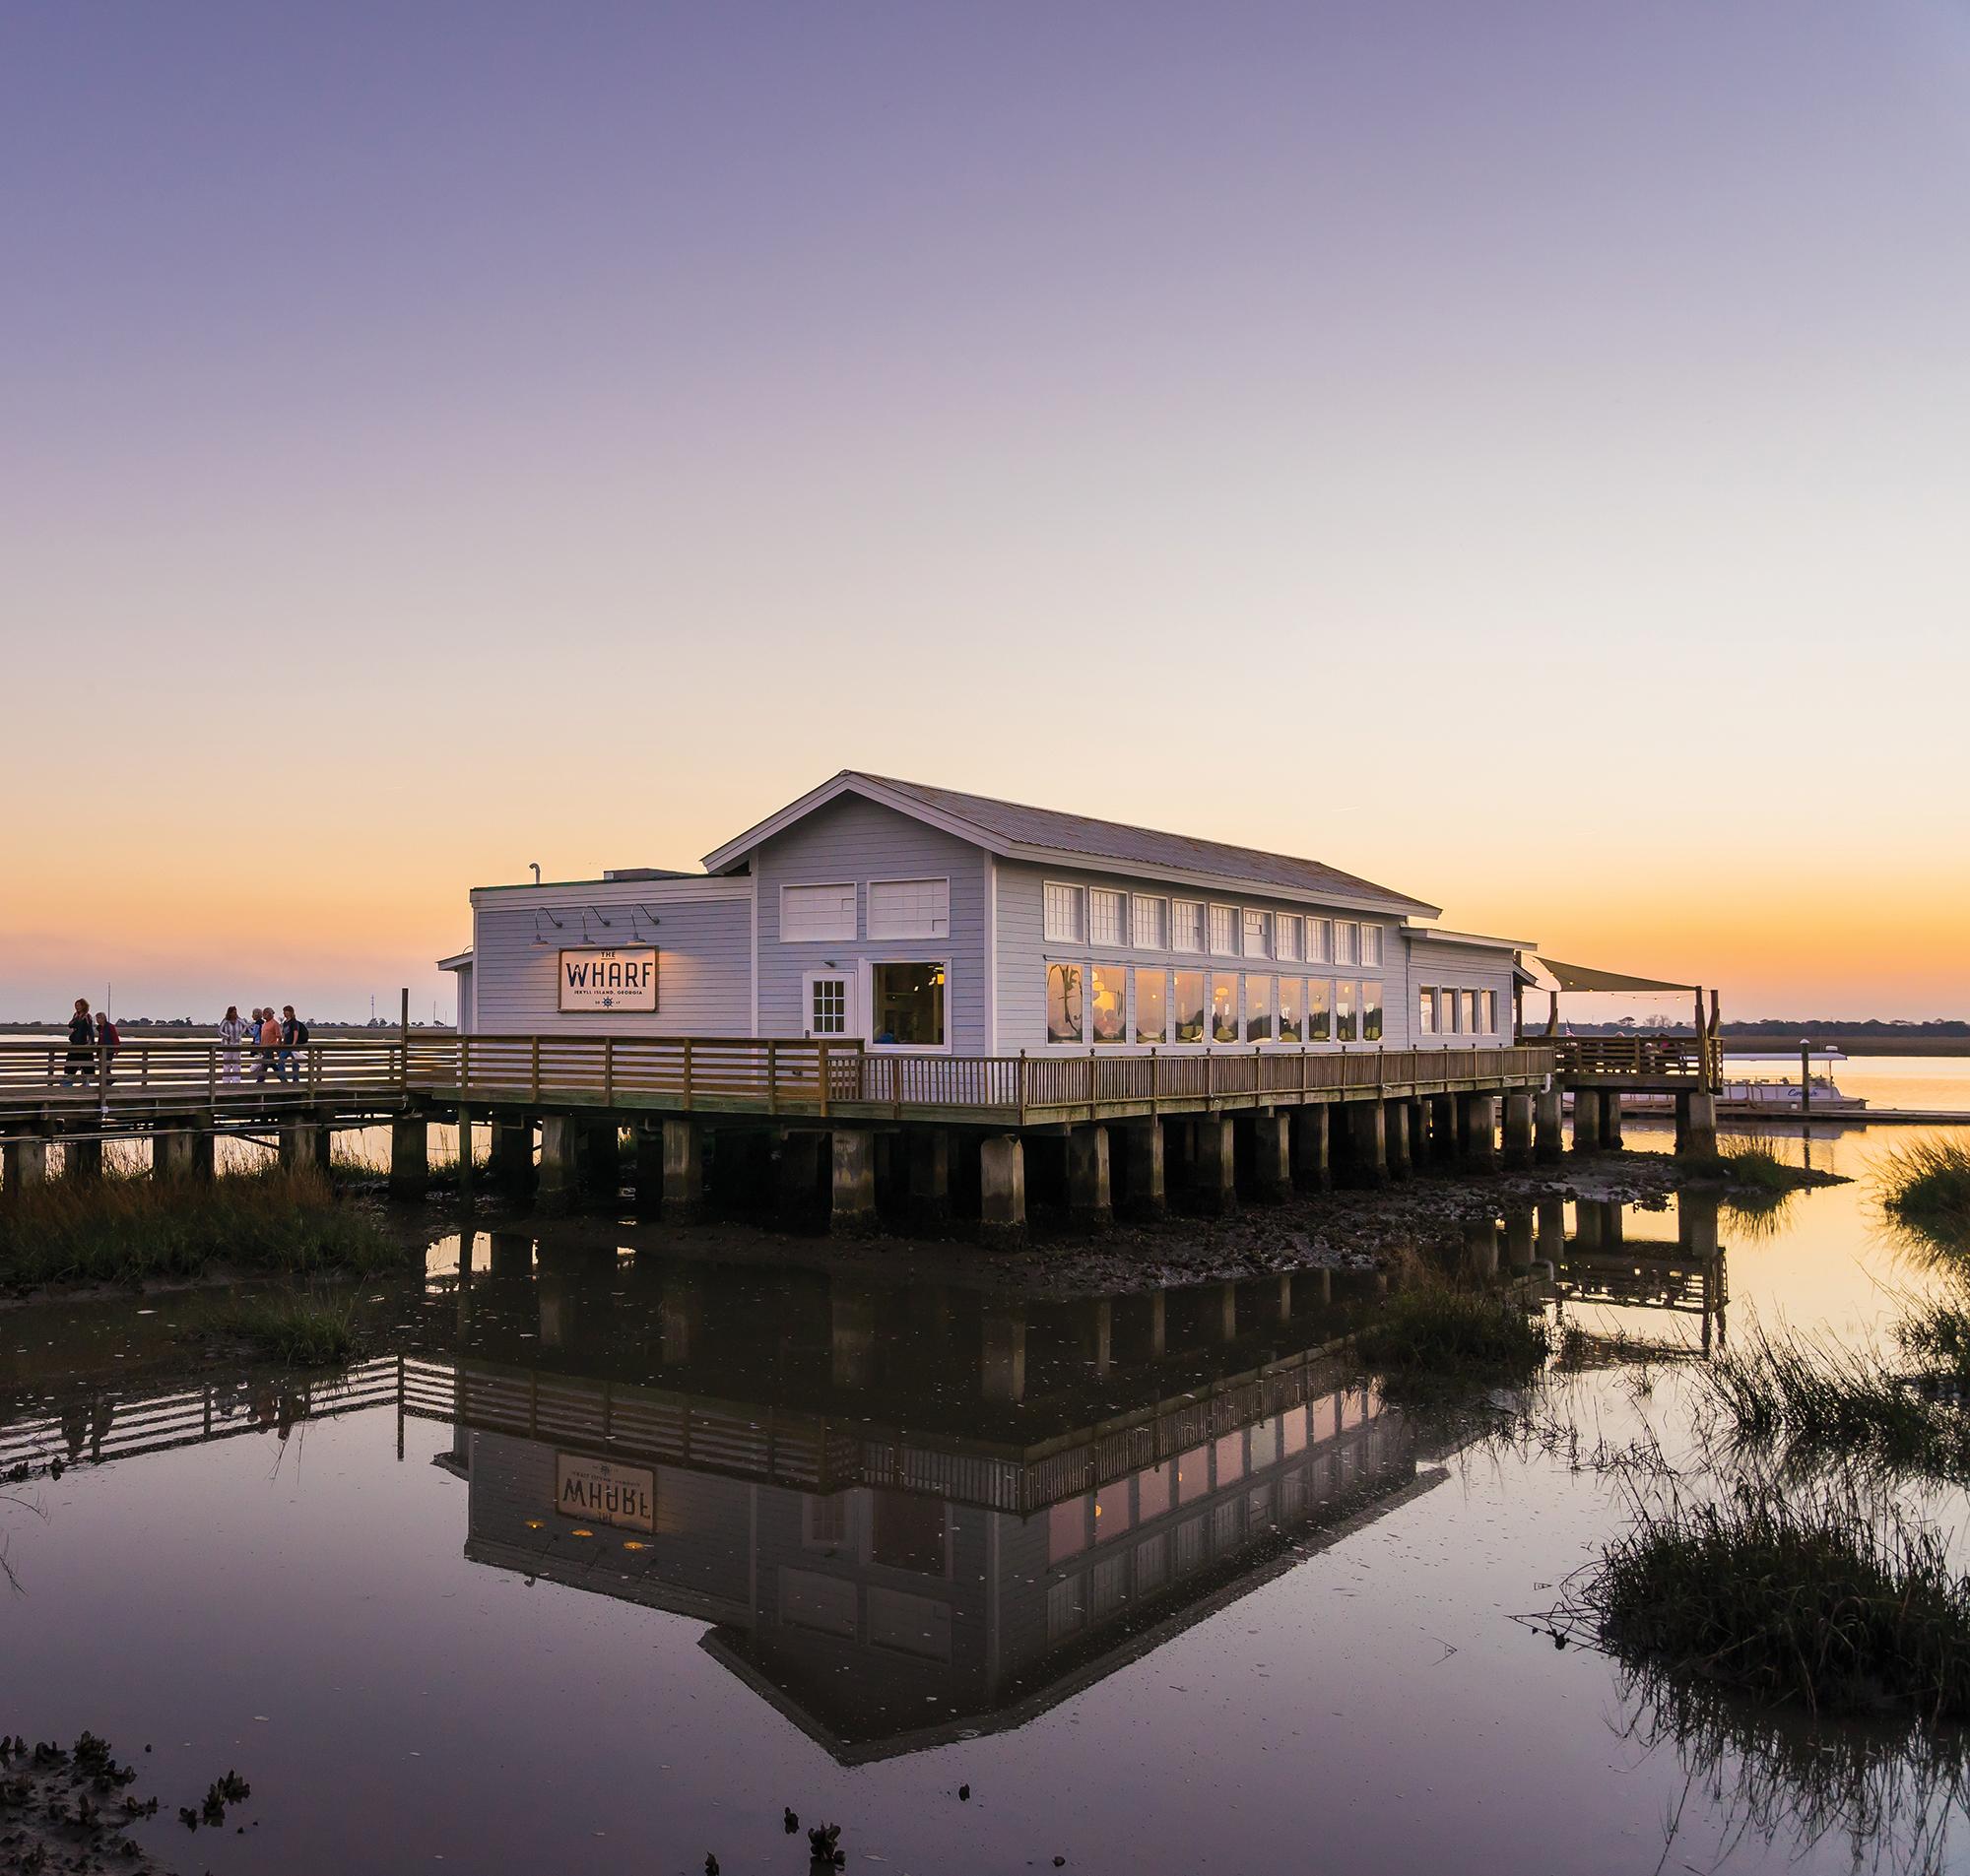 The Wharf Restaurant 1